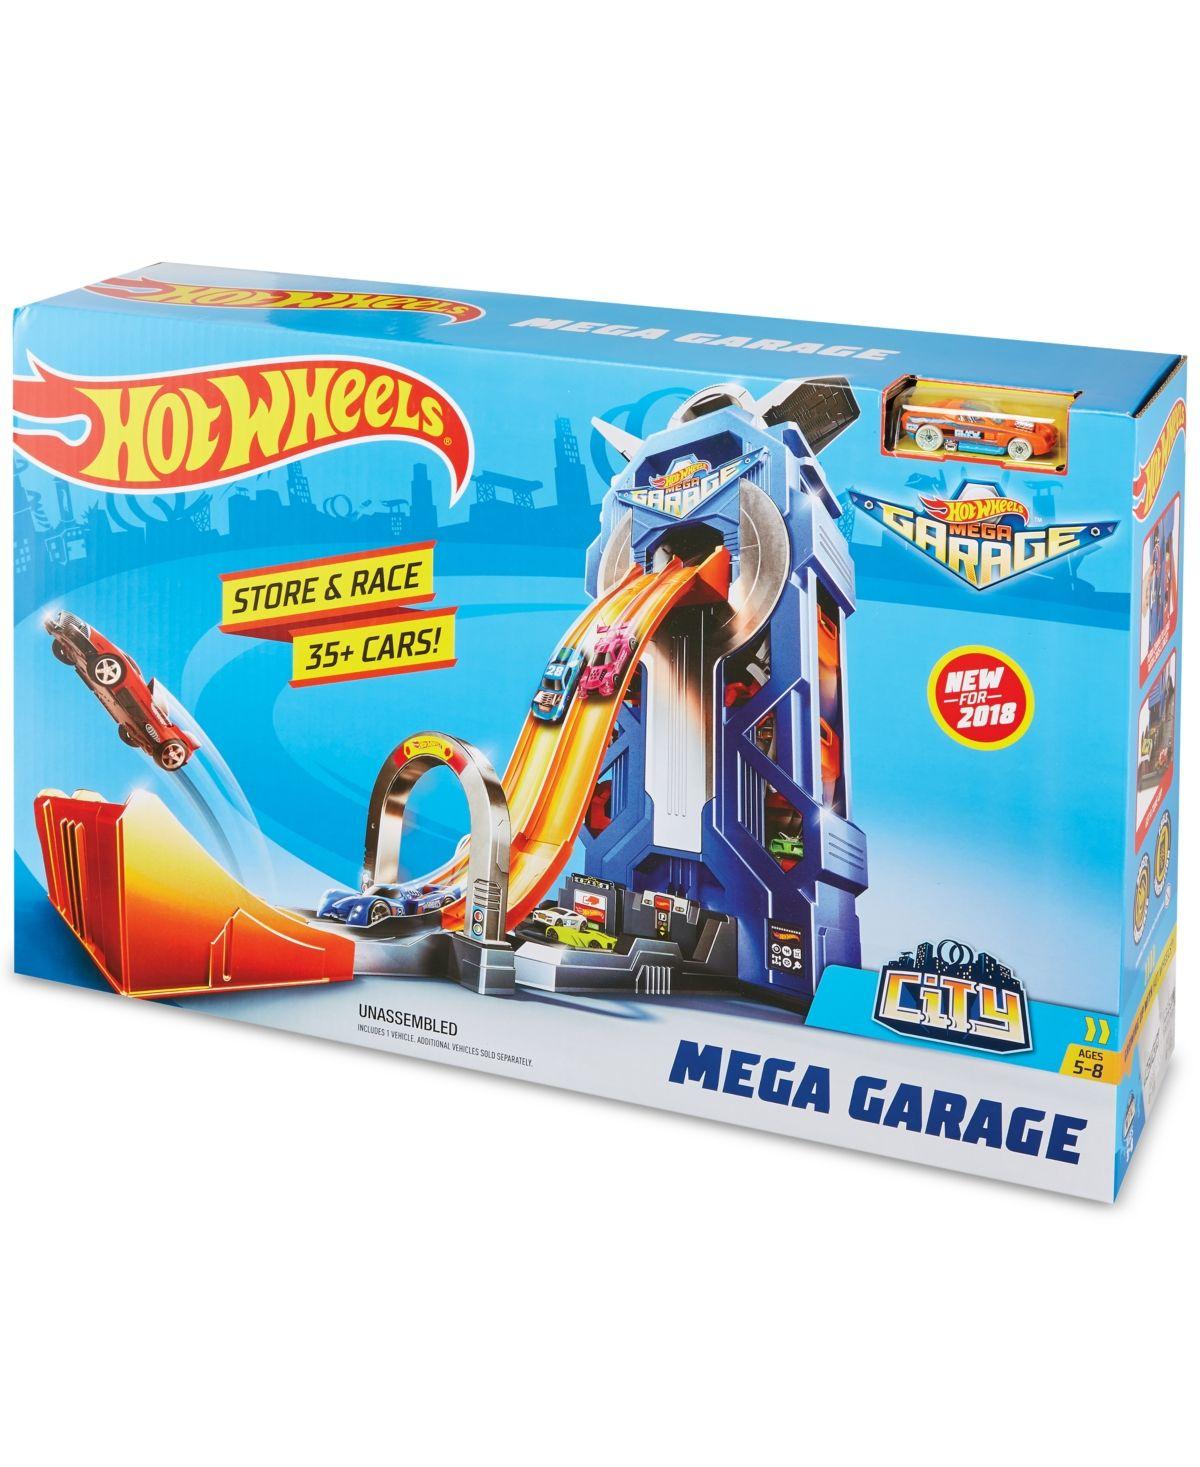 Hot Wheels Mattel Mega Garage & Reviews - Home - Macy's